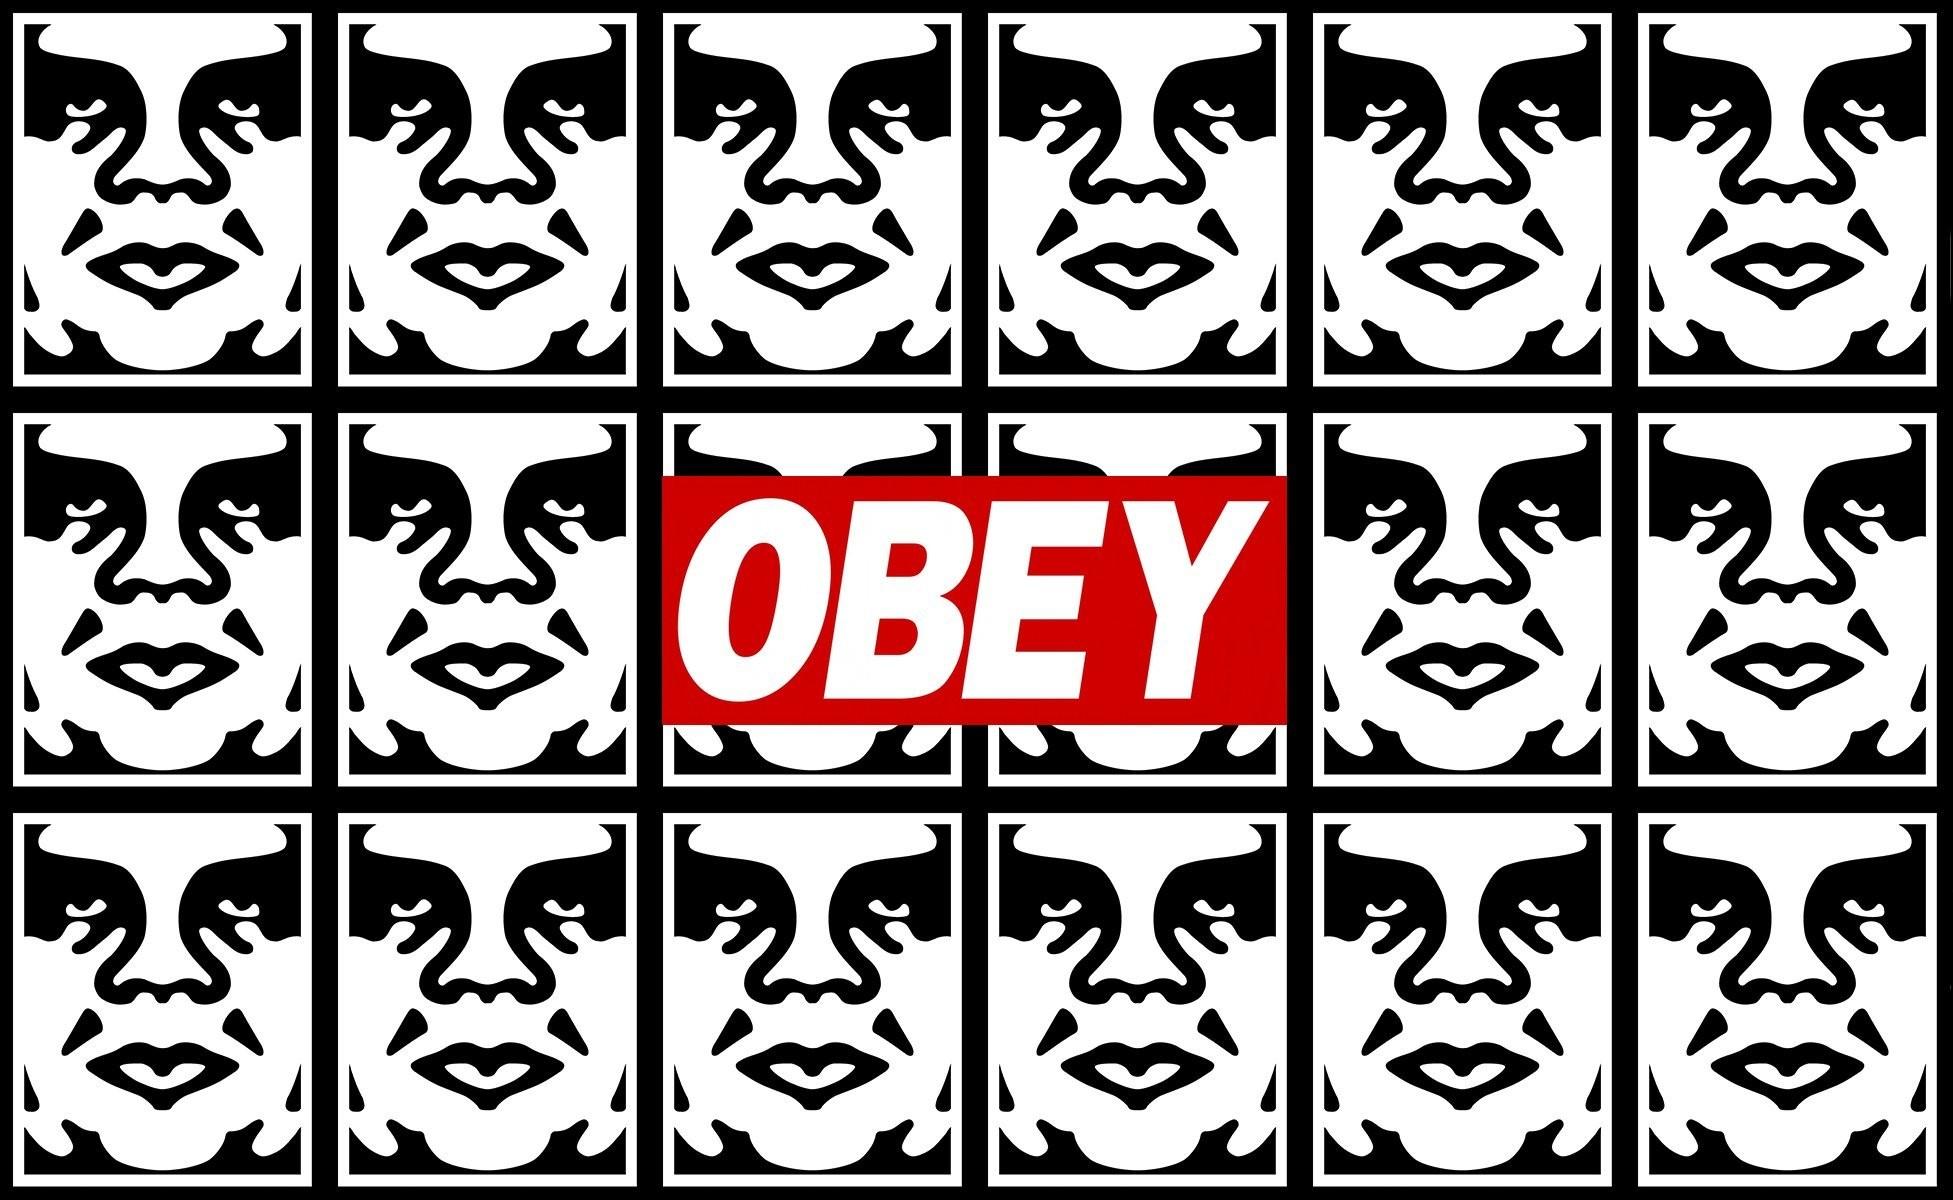 obey obey graffiti stencils